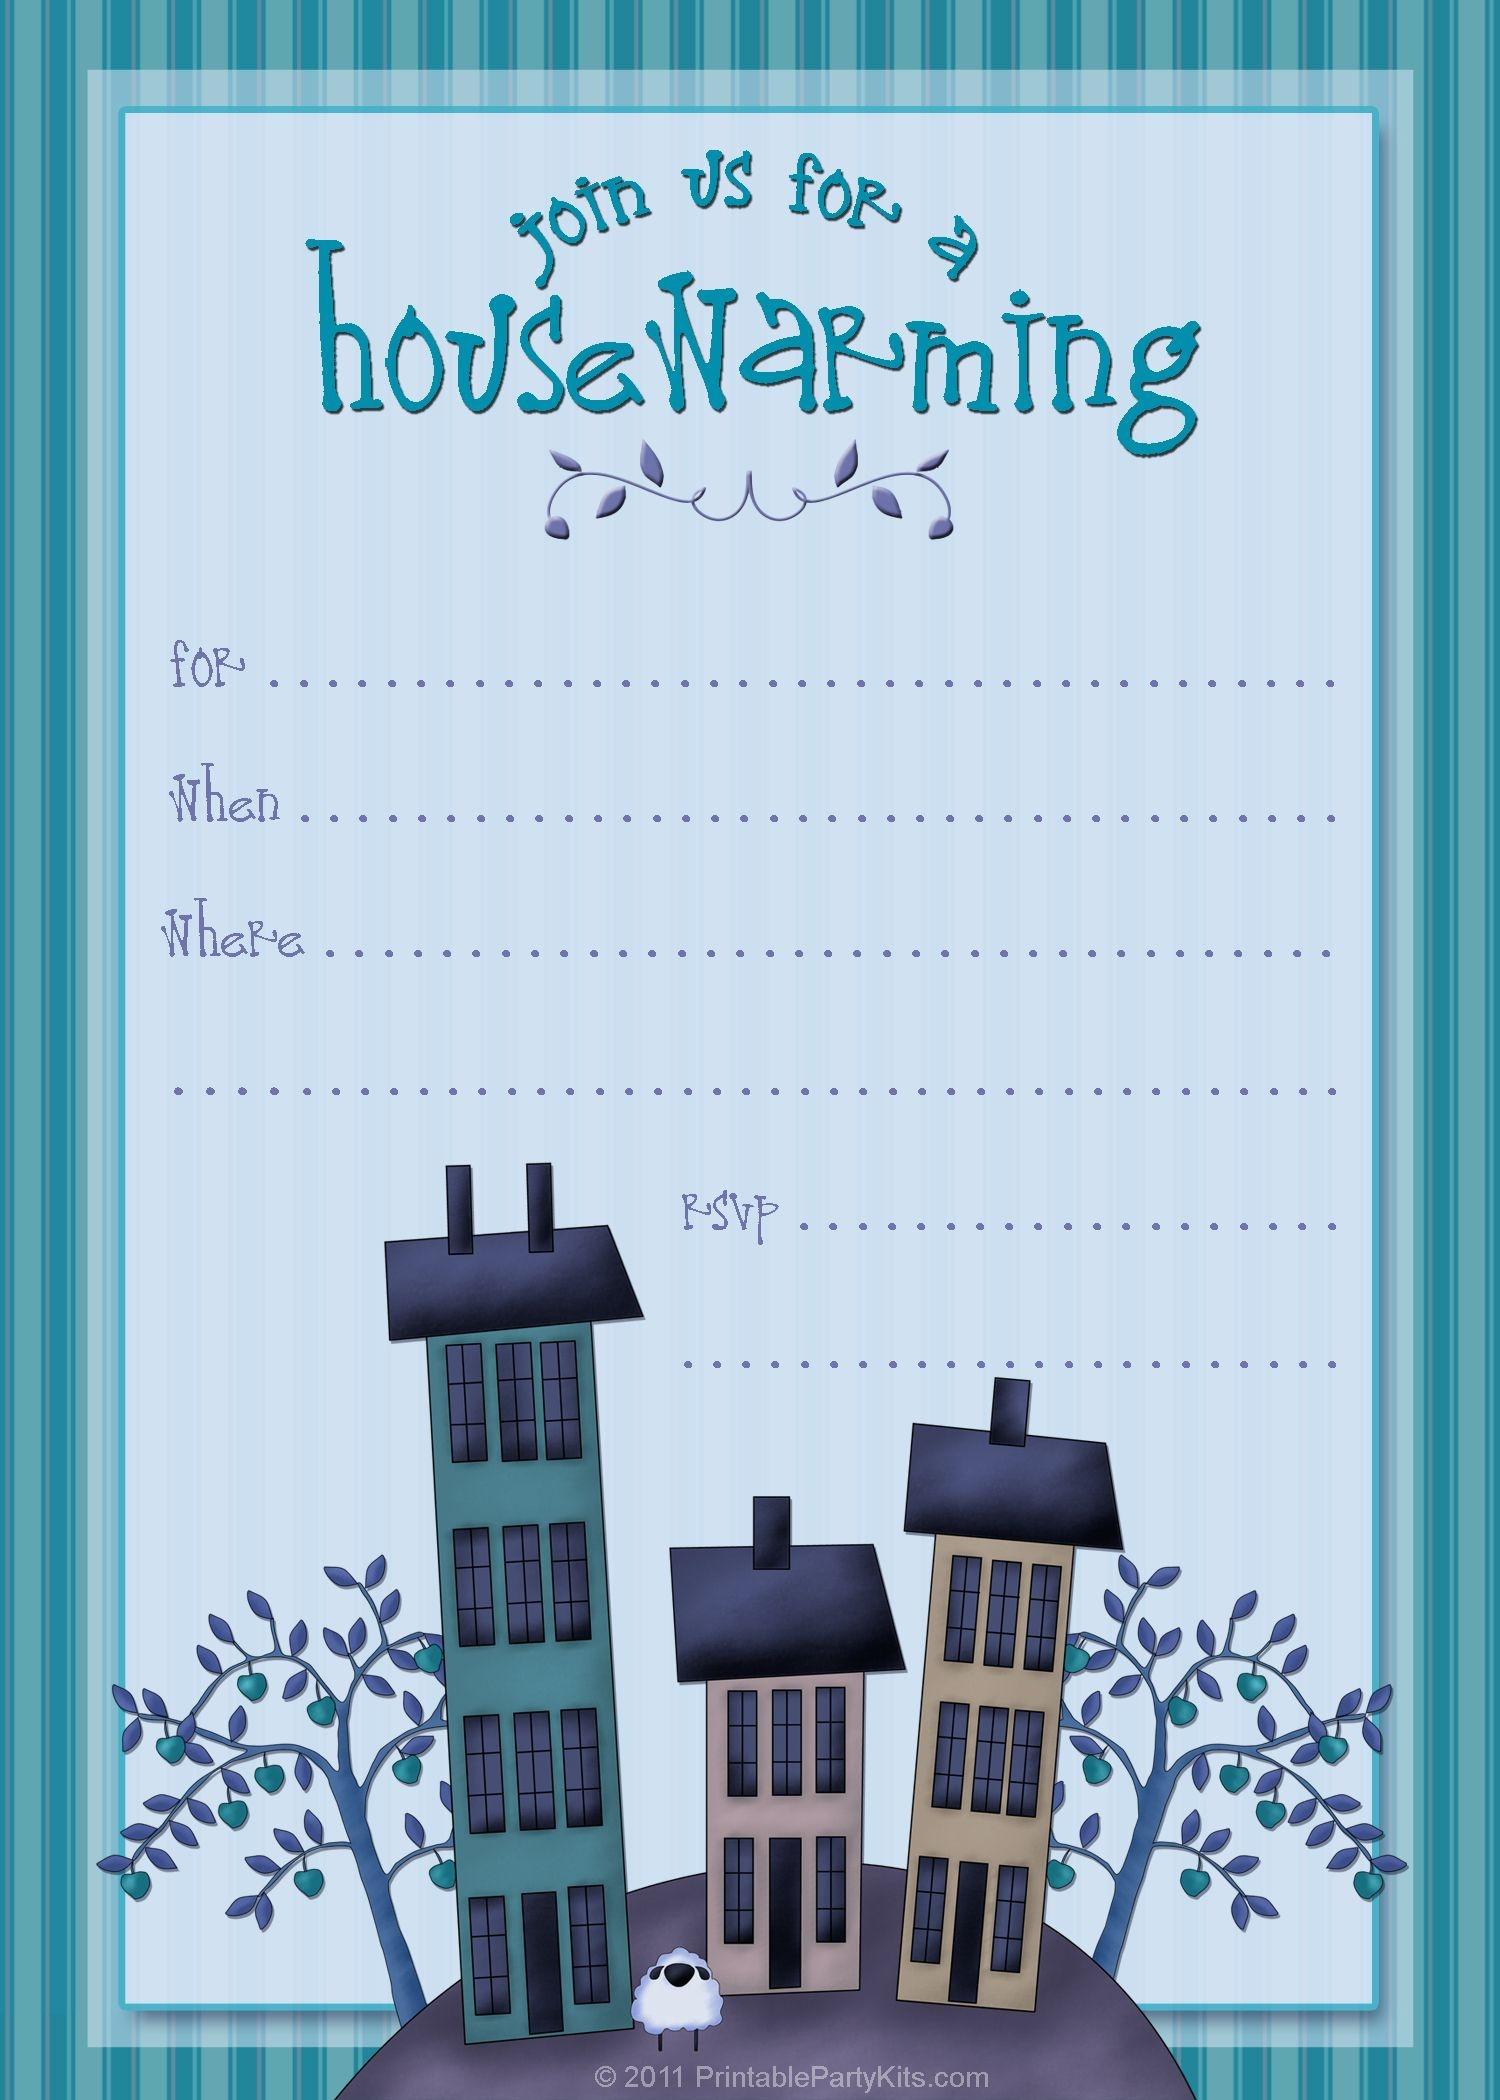 Housewarming Invite Template | Tanveer | Housewarming Party - Free Printable Housewarming Invitations Cards